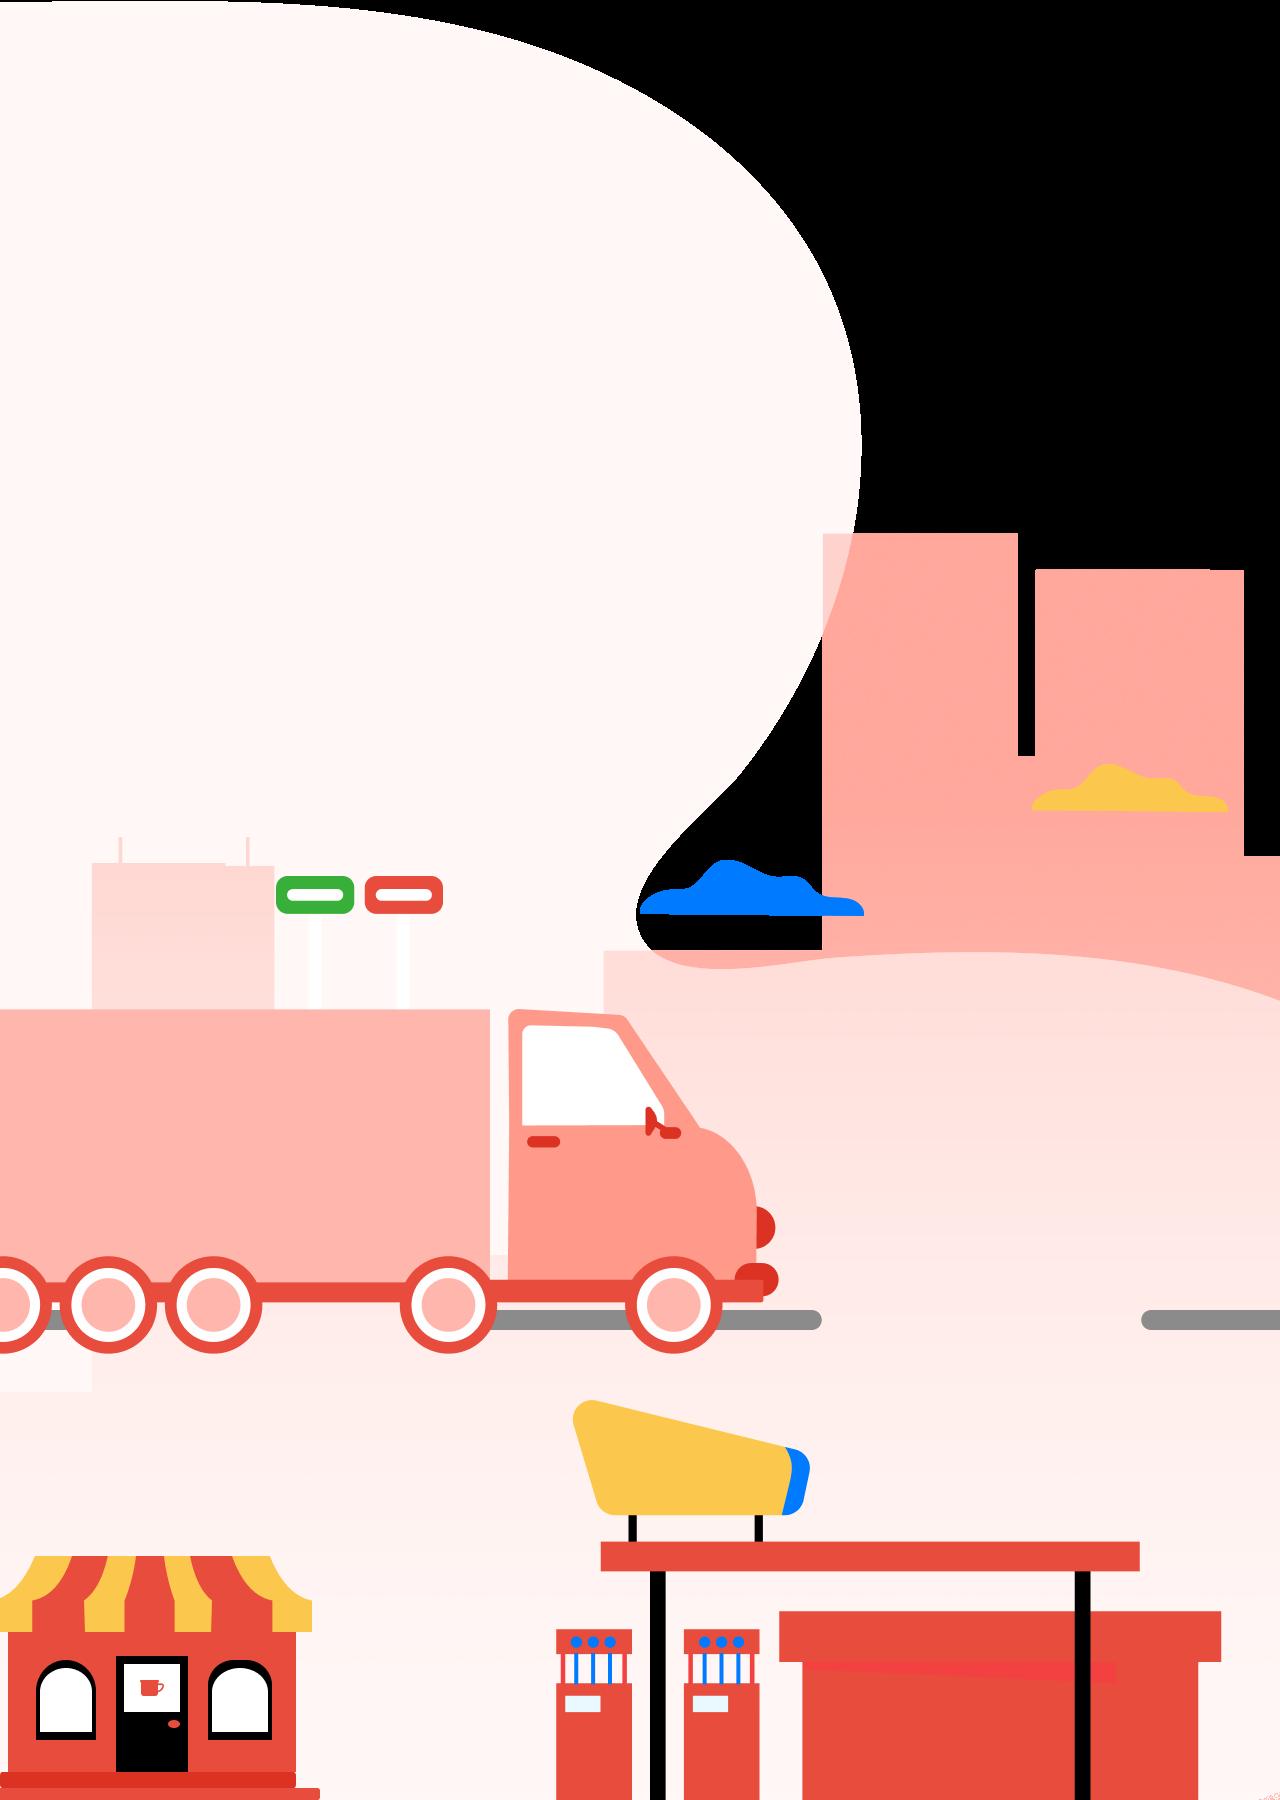 truckfly-image-publisher/advertiser-banner-mobile.png